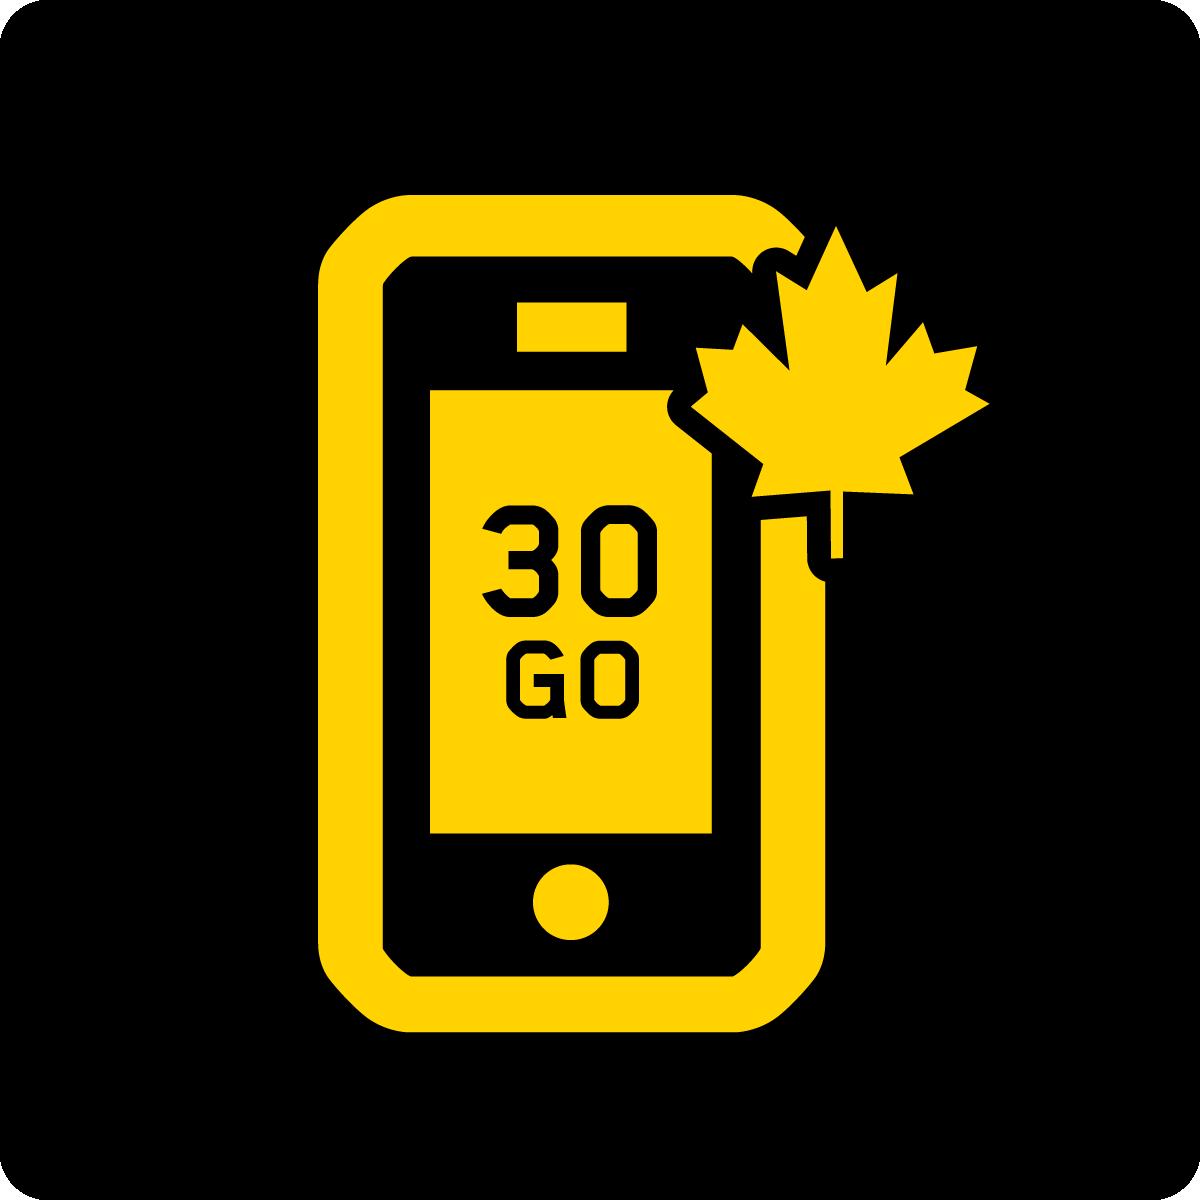 Forfait Mobile Affaires Canada 30Go